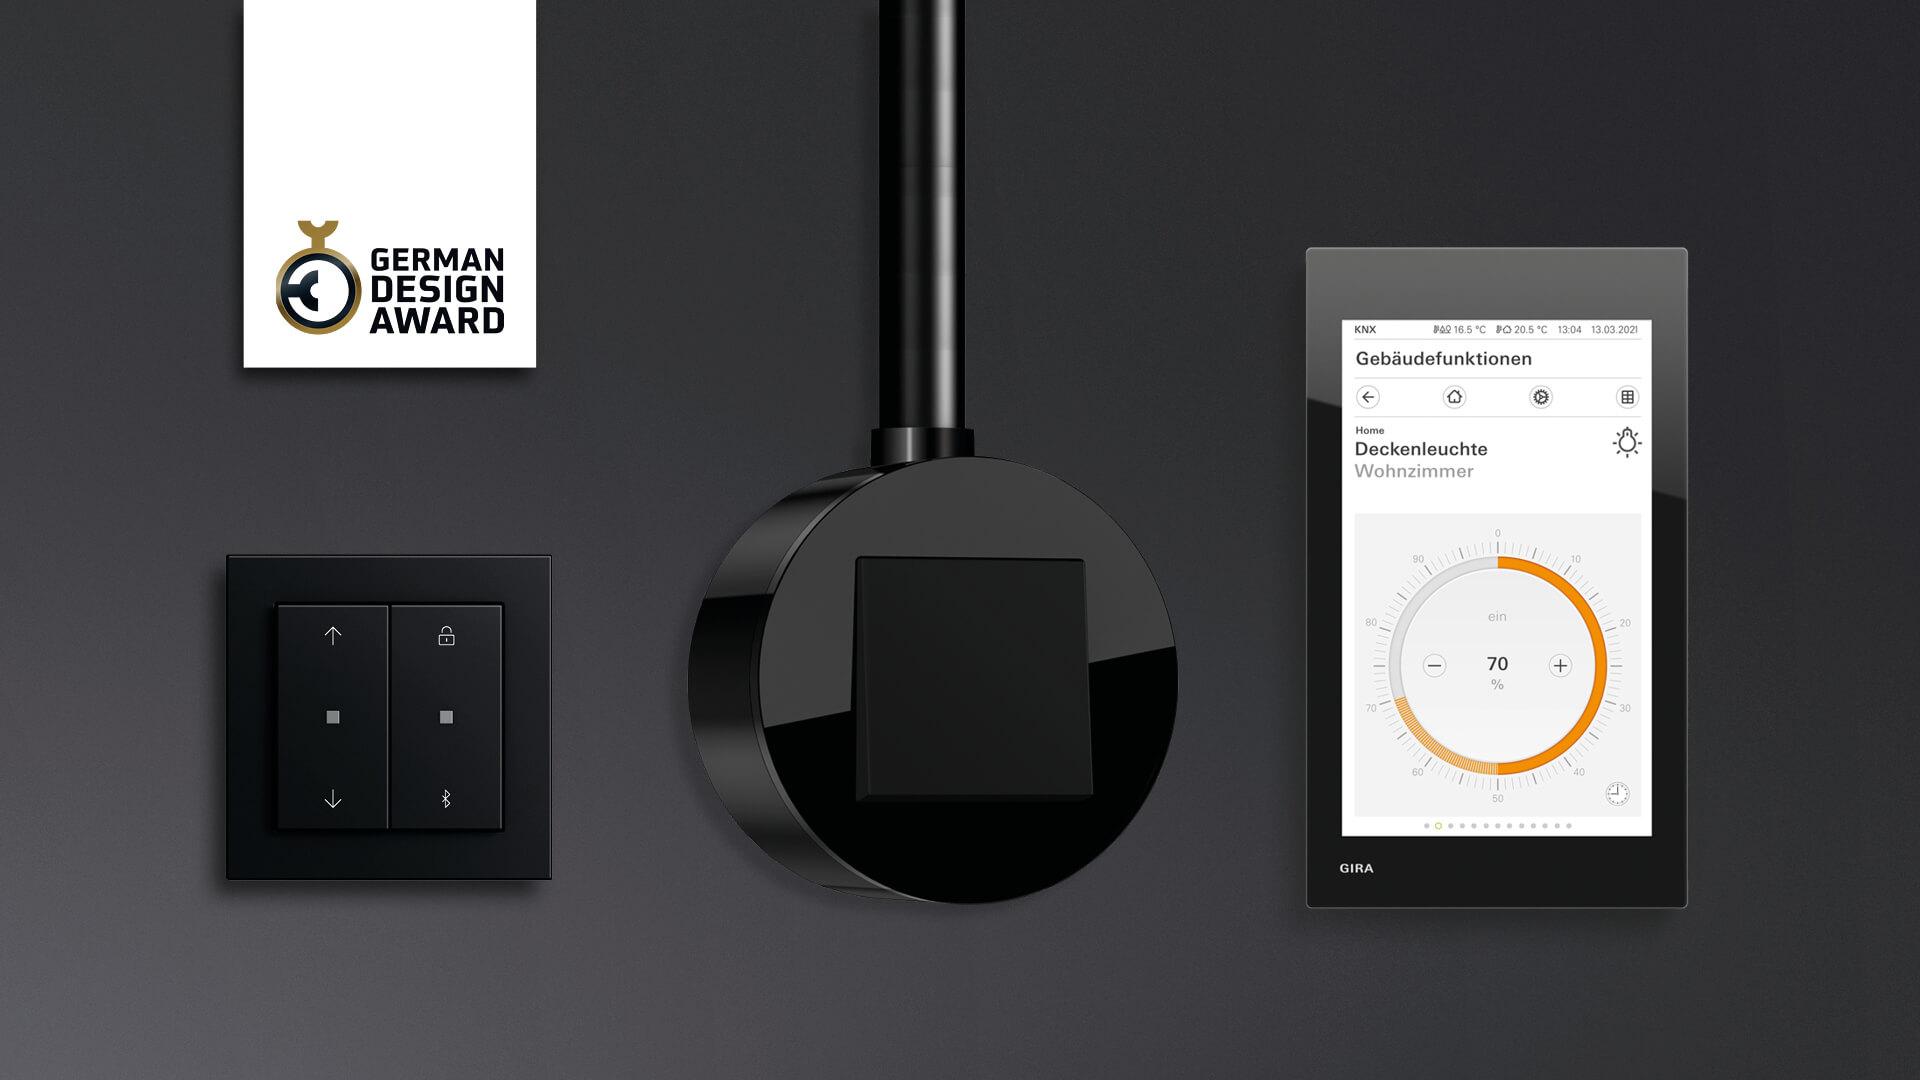 German Design Award System 3000, Gira Studio, Gira G1